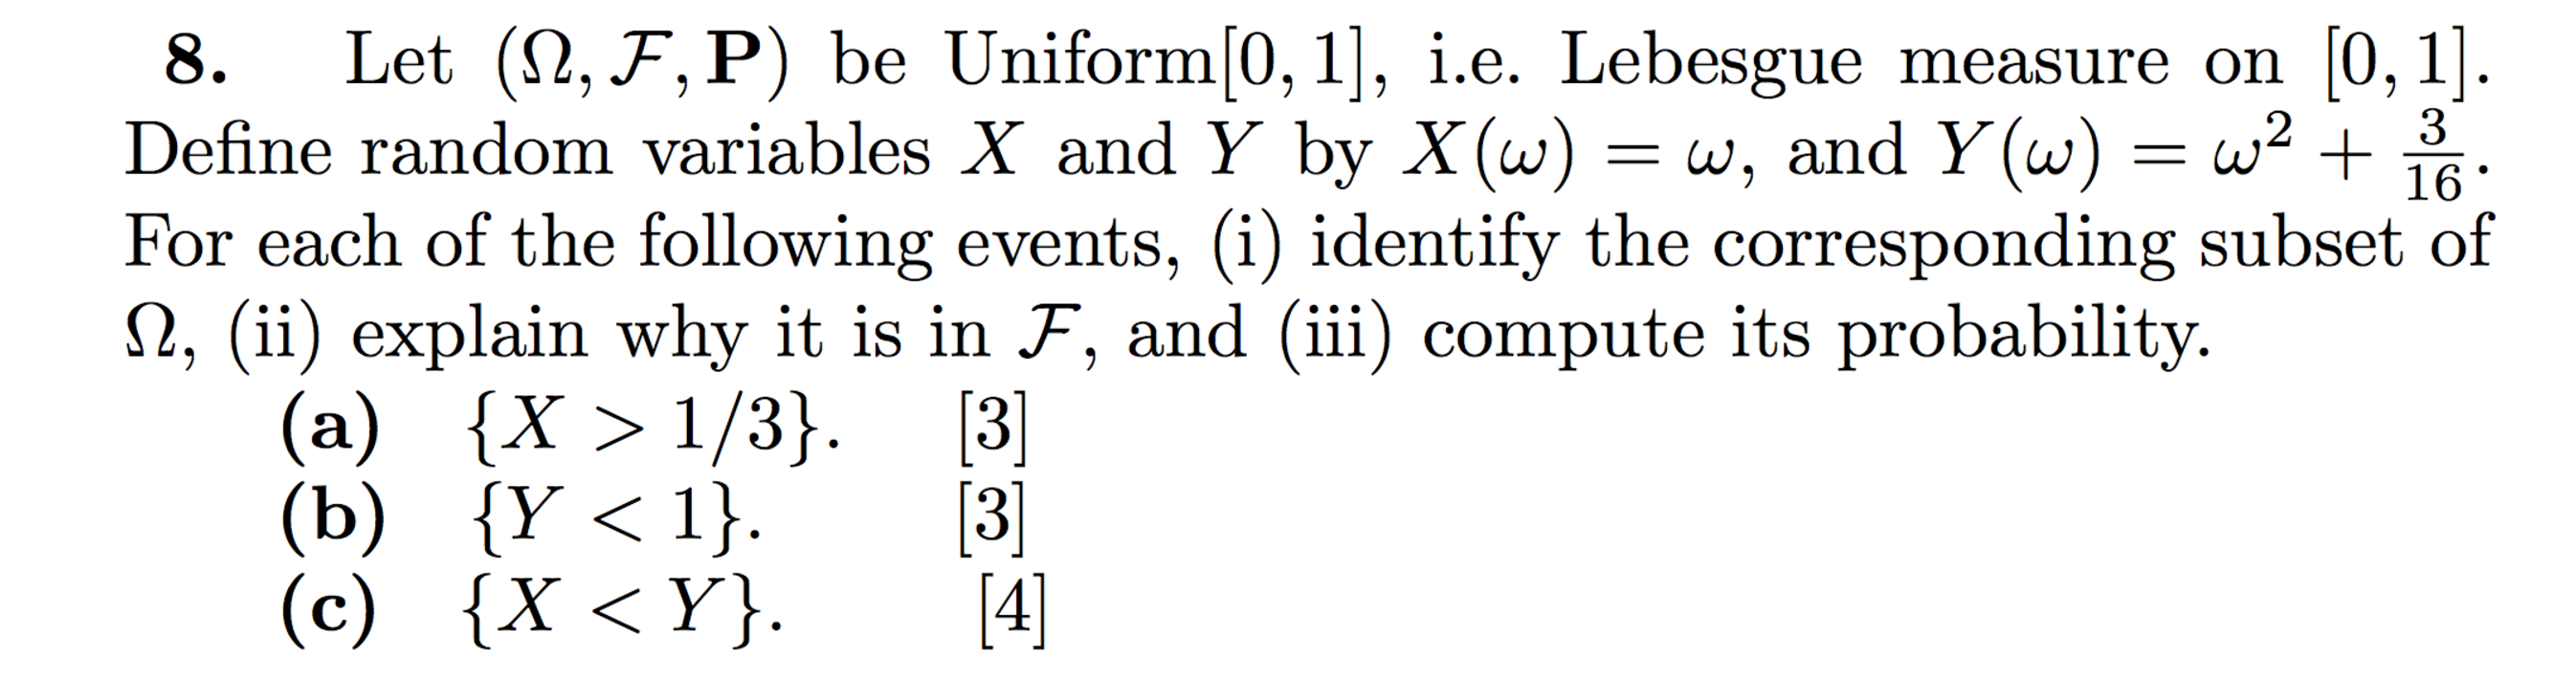 probability homework solutions